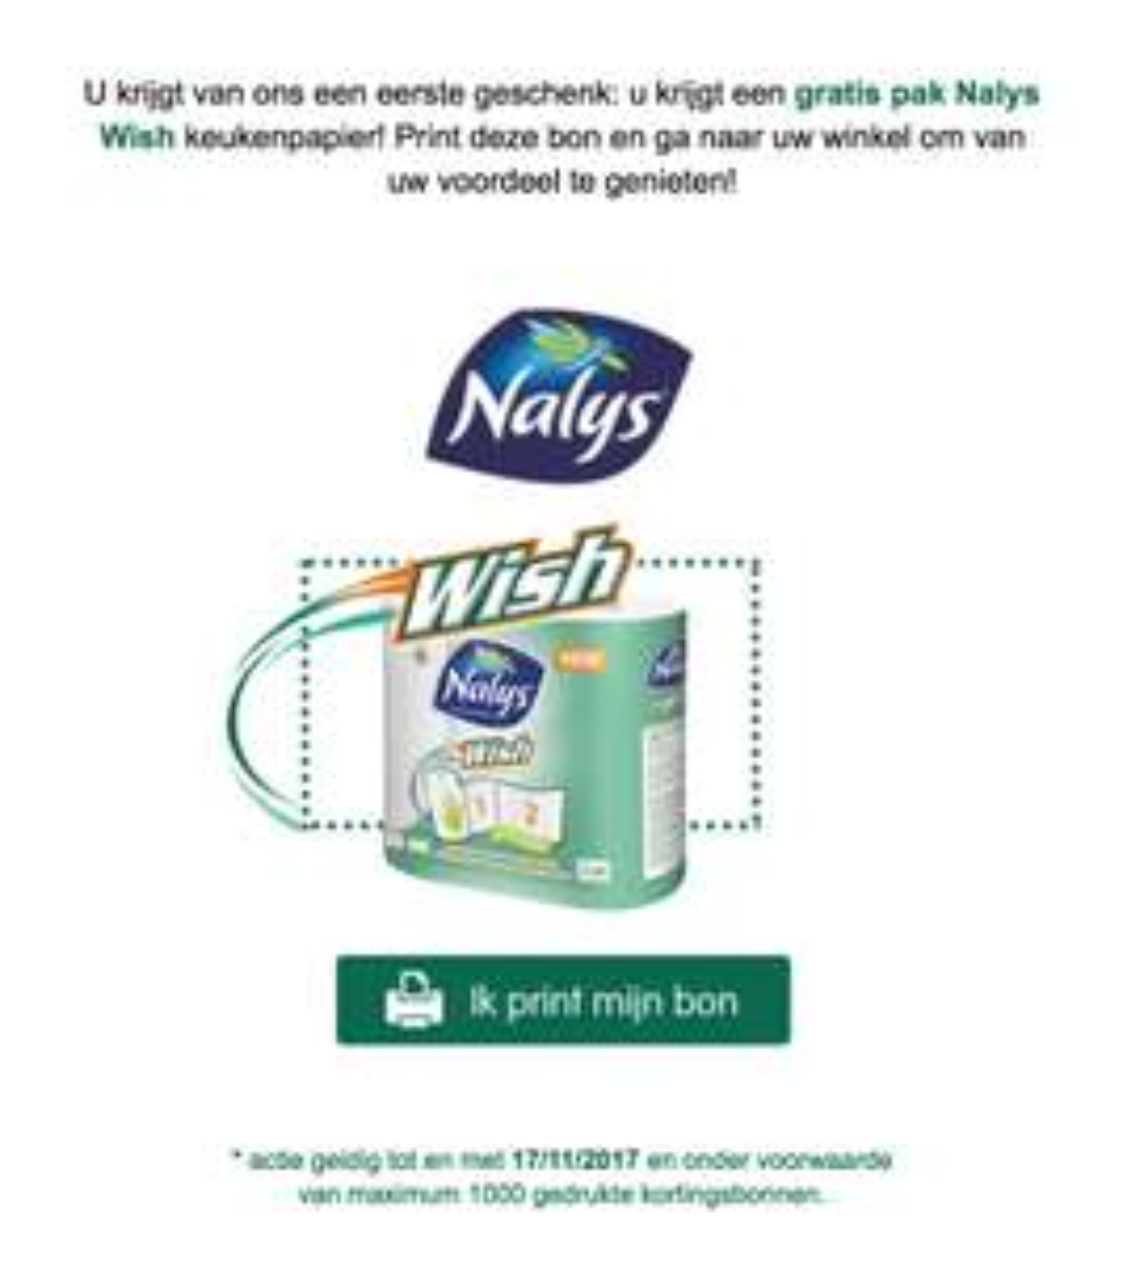 Gratis Nalys wish keukenpapier (België)